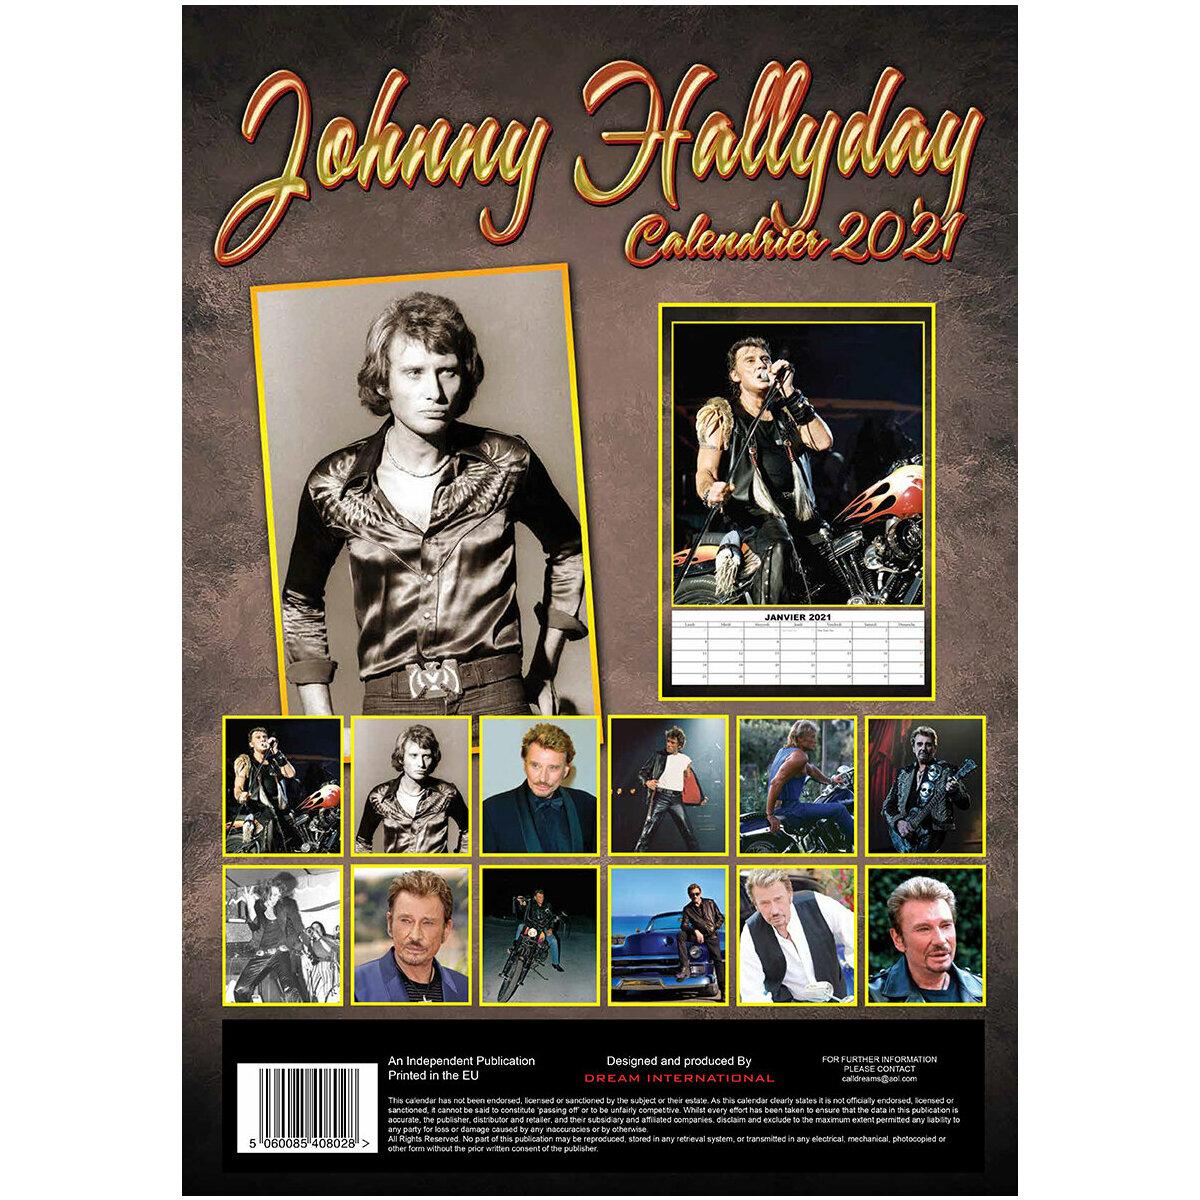 Calendrier 2021 Johnny Hallyday Calendrier 2021 Johnny Hallyday format A3